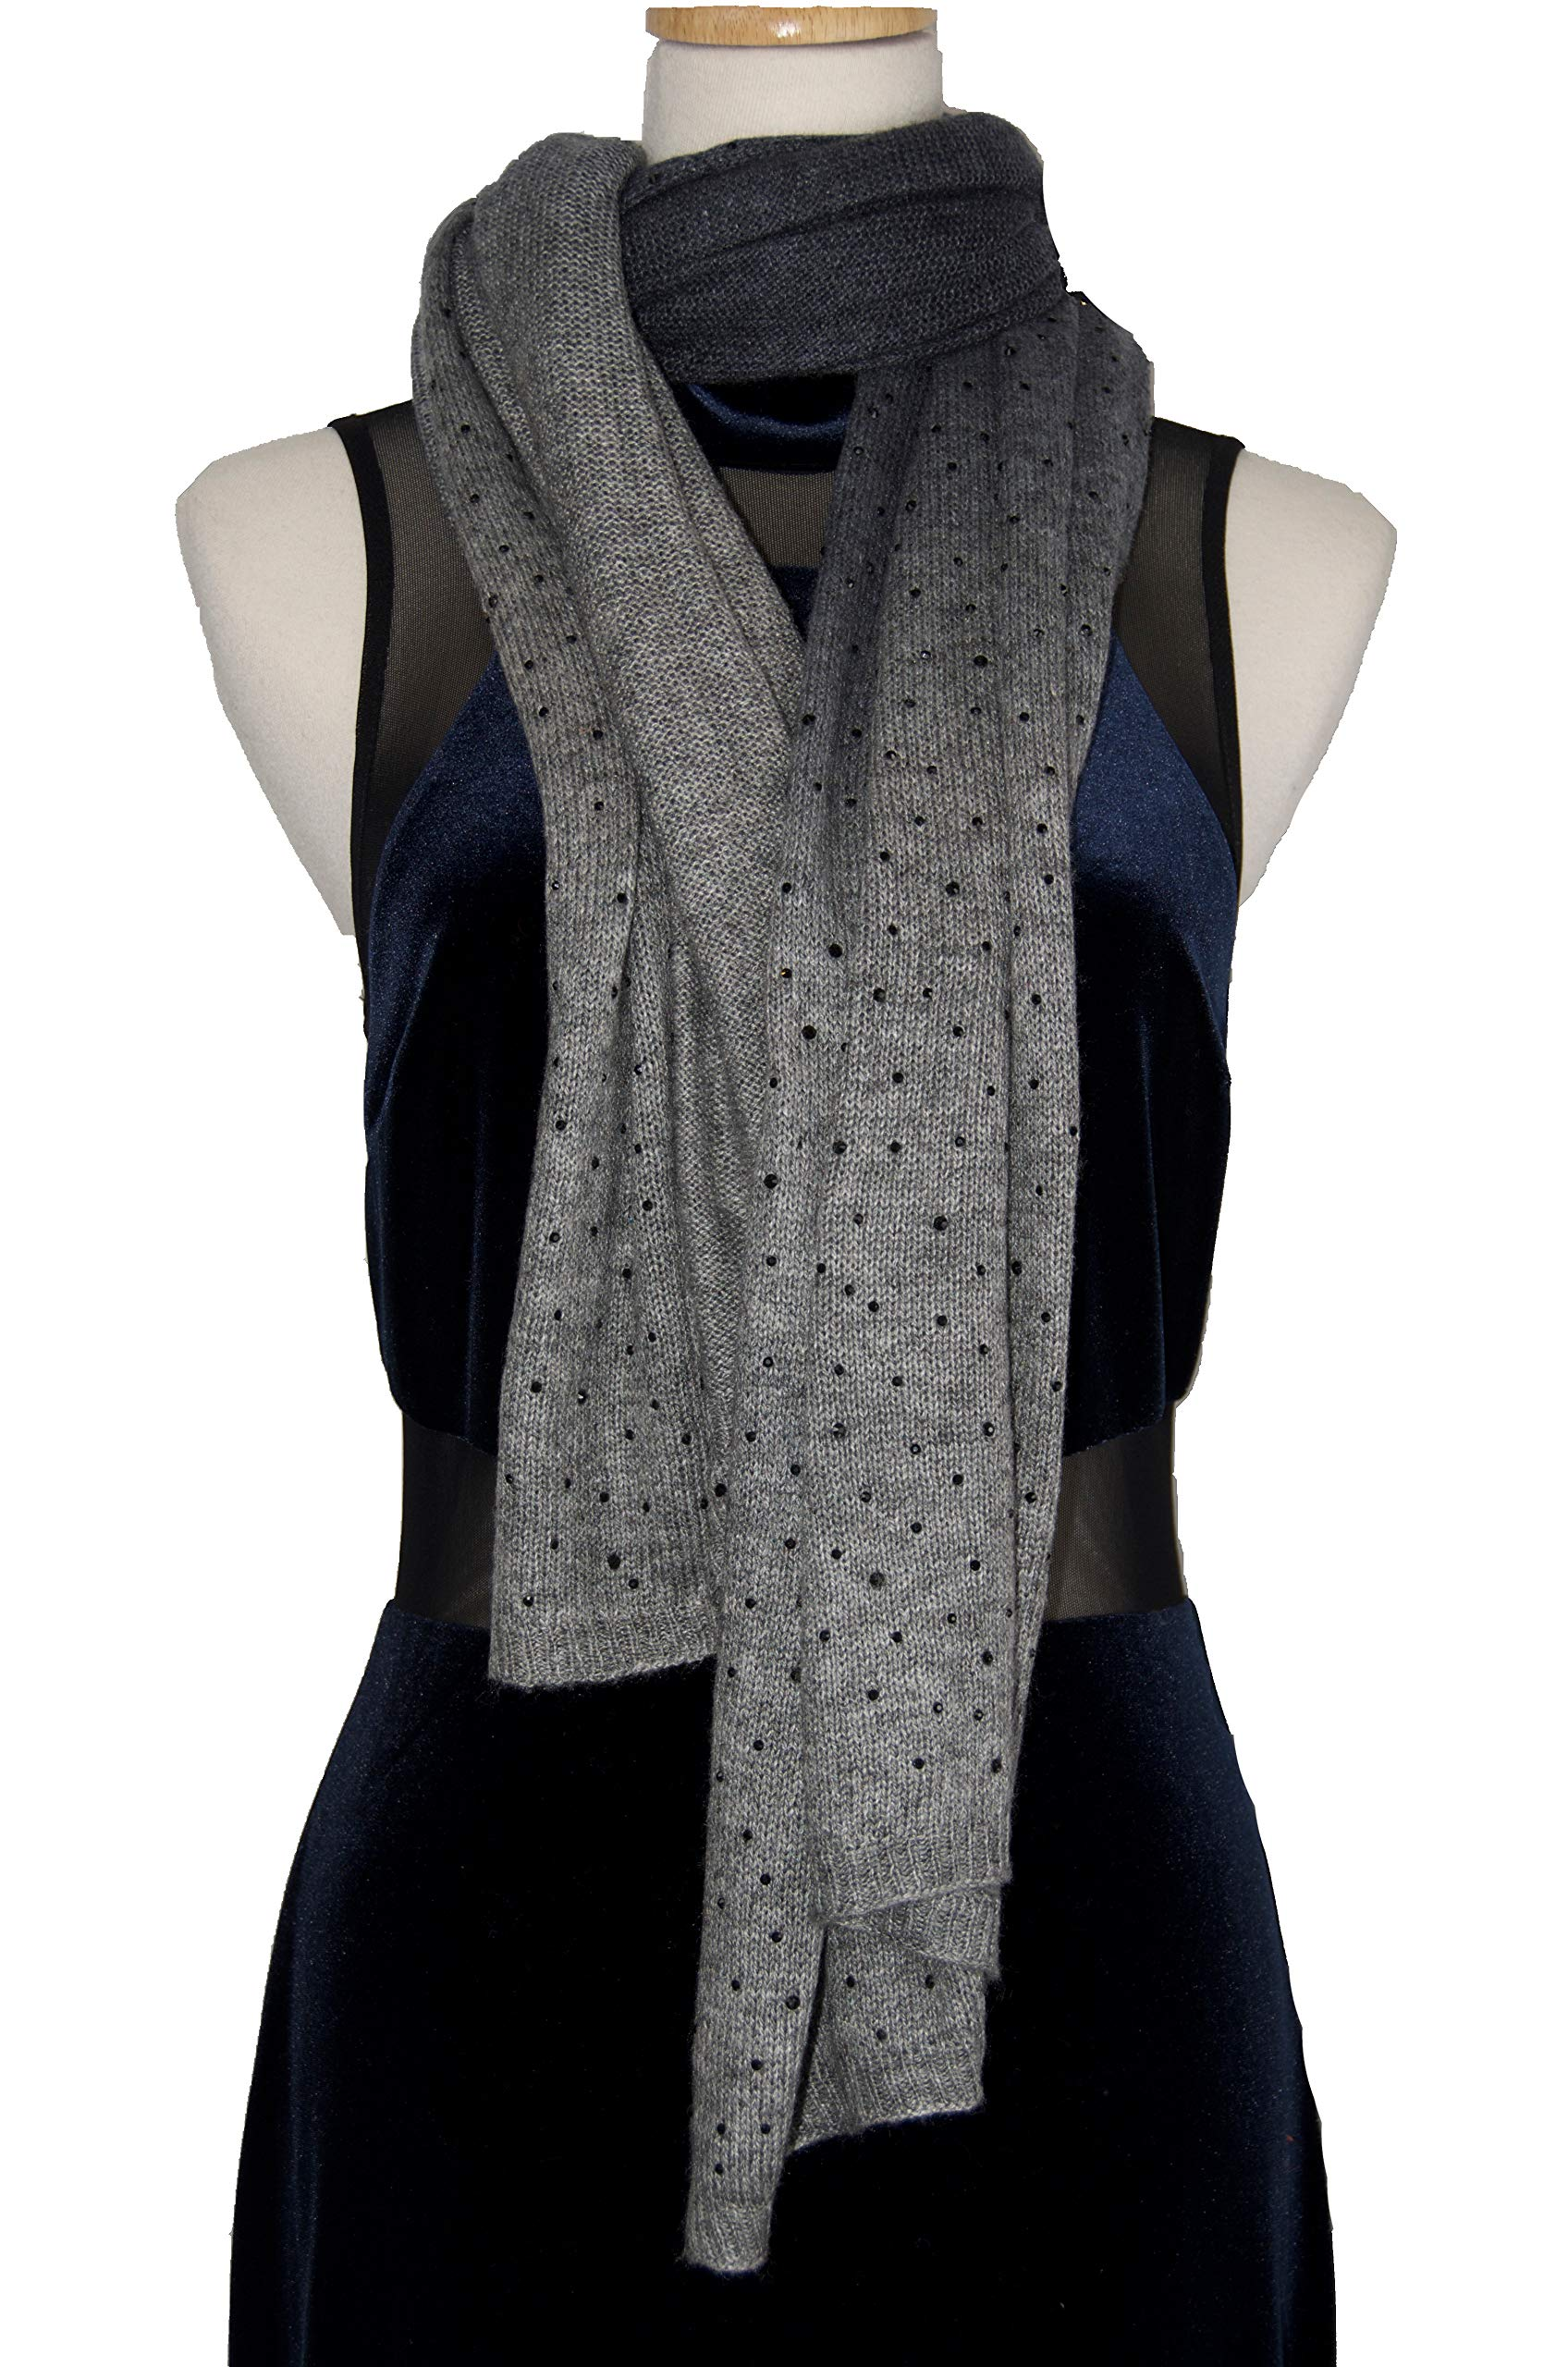 Cashmere Shawl Scarf Handmade 100% Pure Lightweight Oversized (Grey black Crystal)